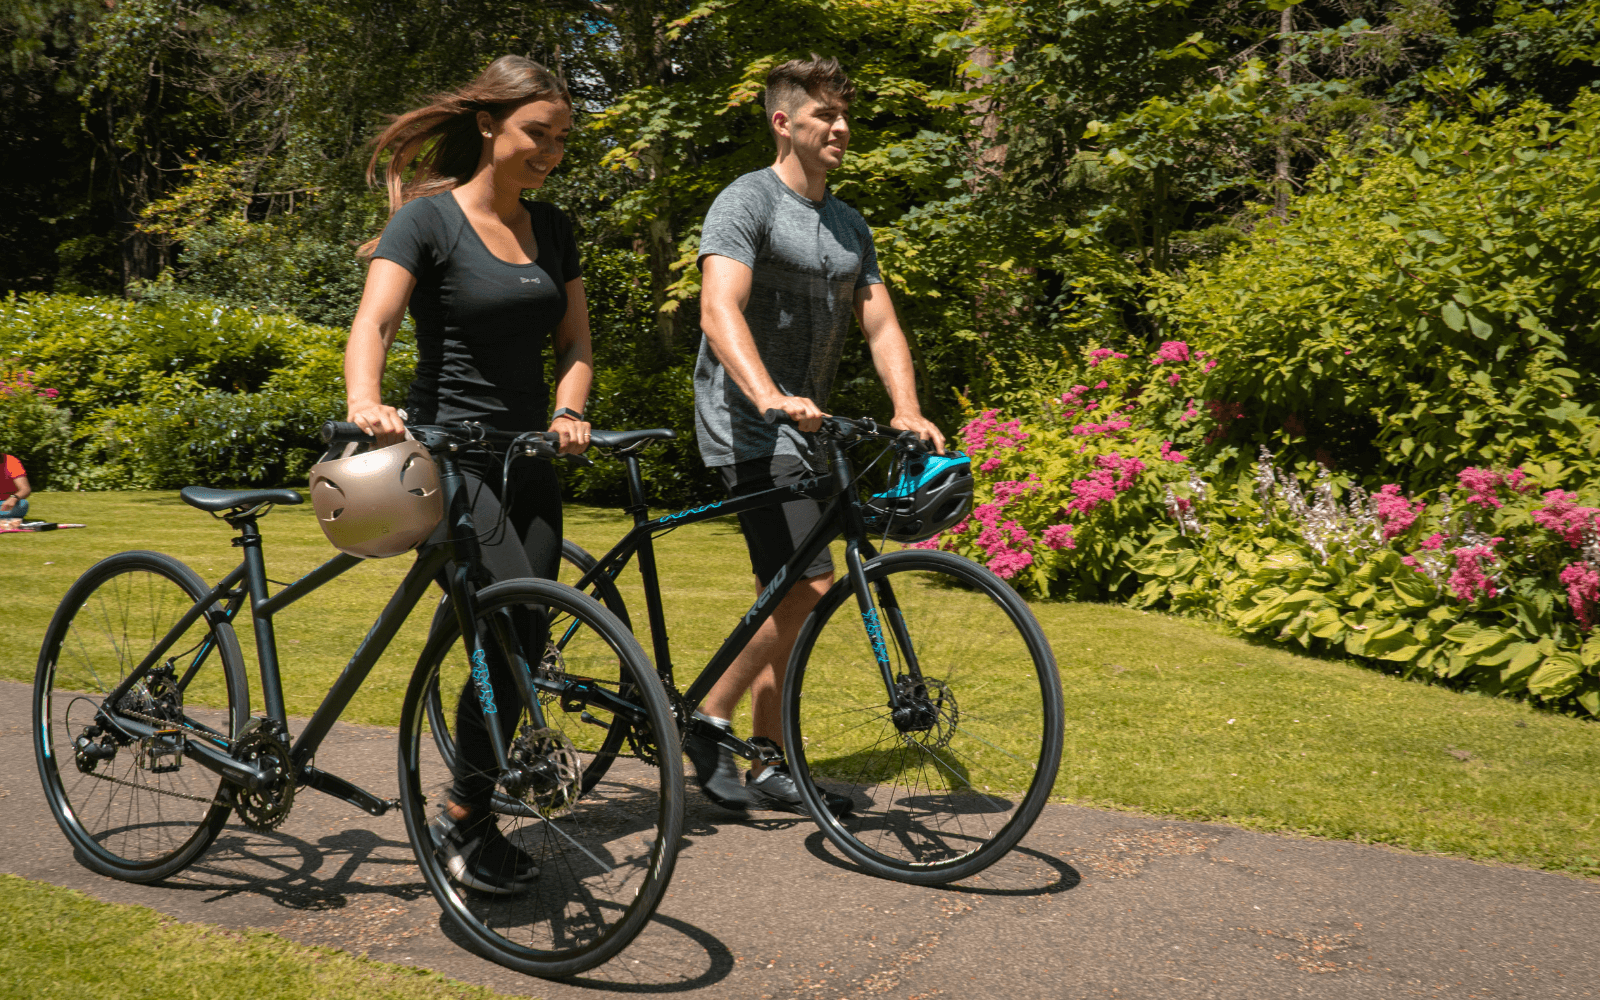 Copy of Copy of Lifestyle images 25 1 - Reid ® - Urban X1 Bike